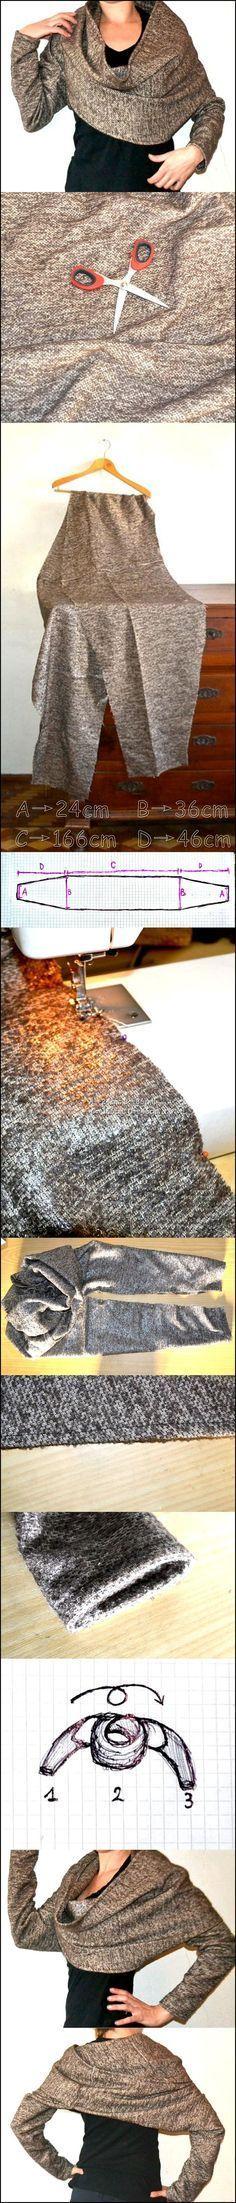 Do it yourself bolero wrap. Cool diy fashion, deconstructed, post-apocalyptic, avant-garde tutorial!